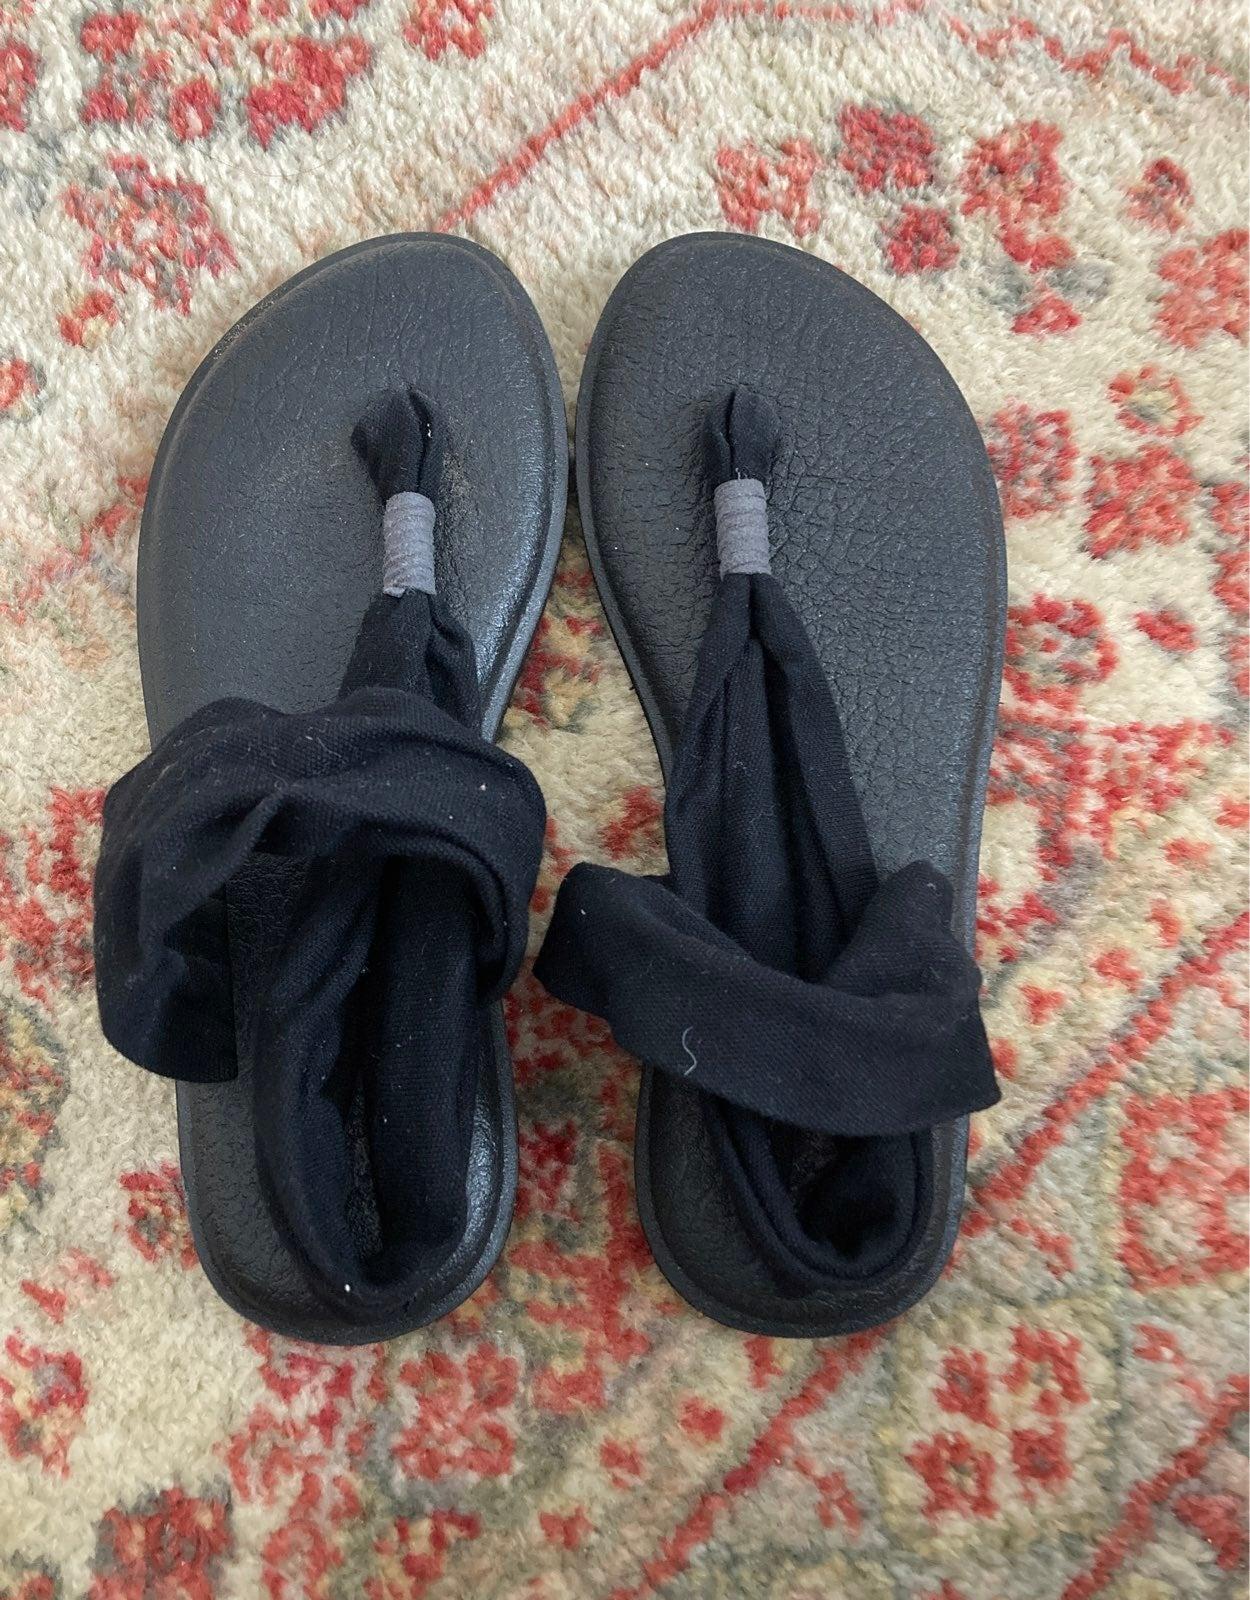 Sanuk sandals size 6